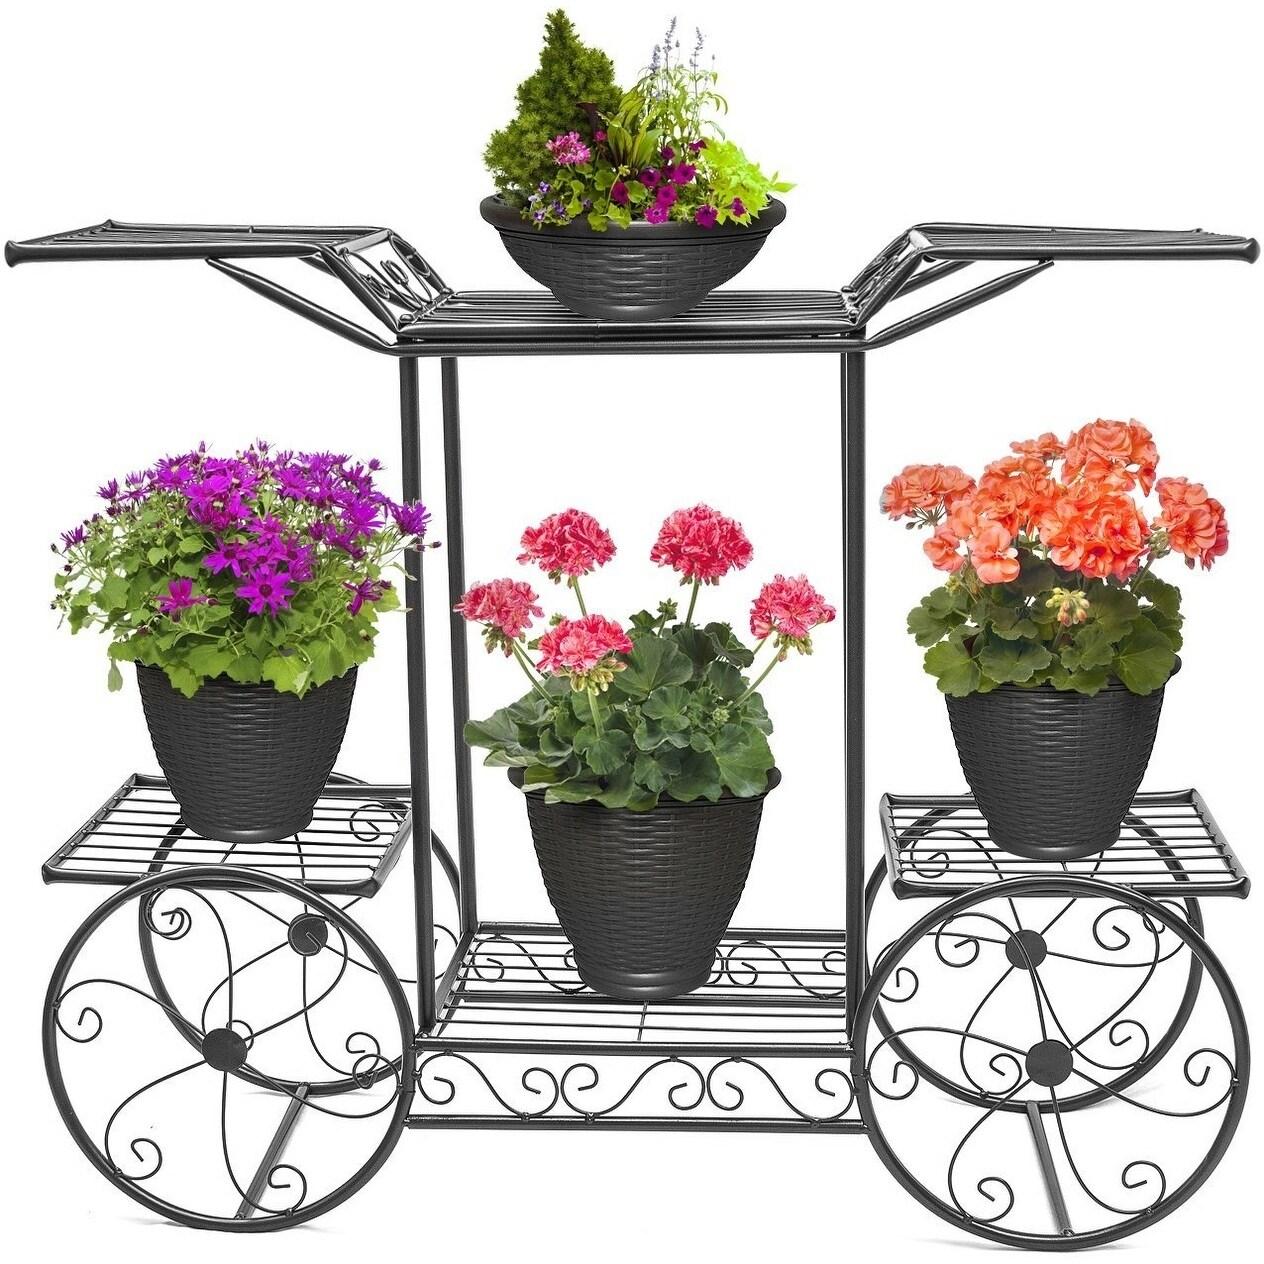 3 Tier Metal Flower Plant Pot Stand Garden Terrace Florist Display Rack Holder